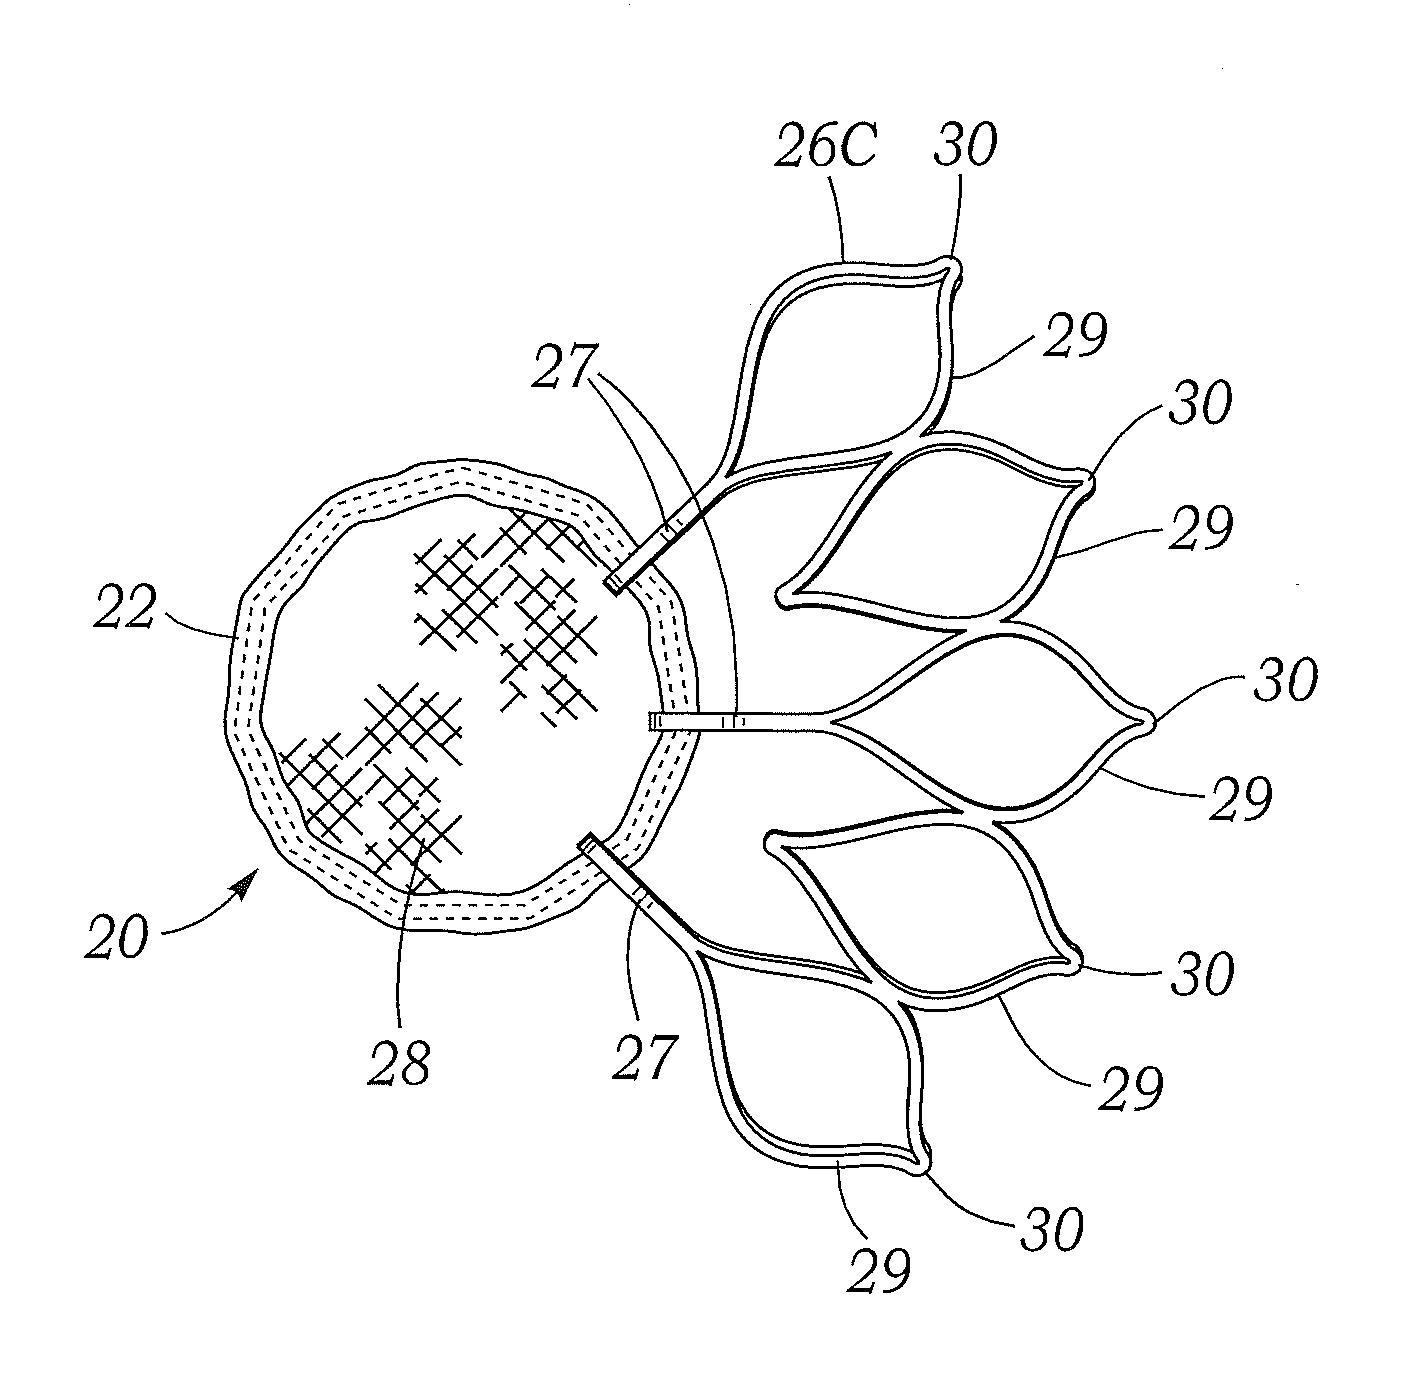 Bulldog alarm wiring diagrams images wiring diagram